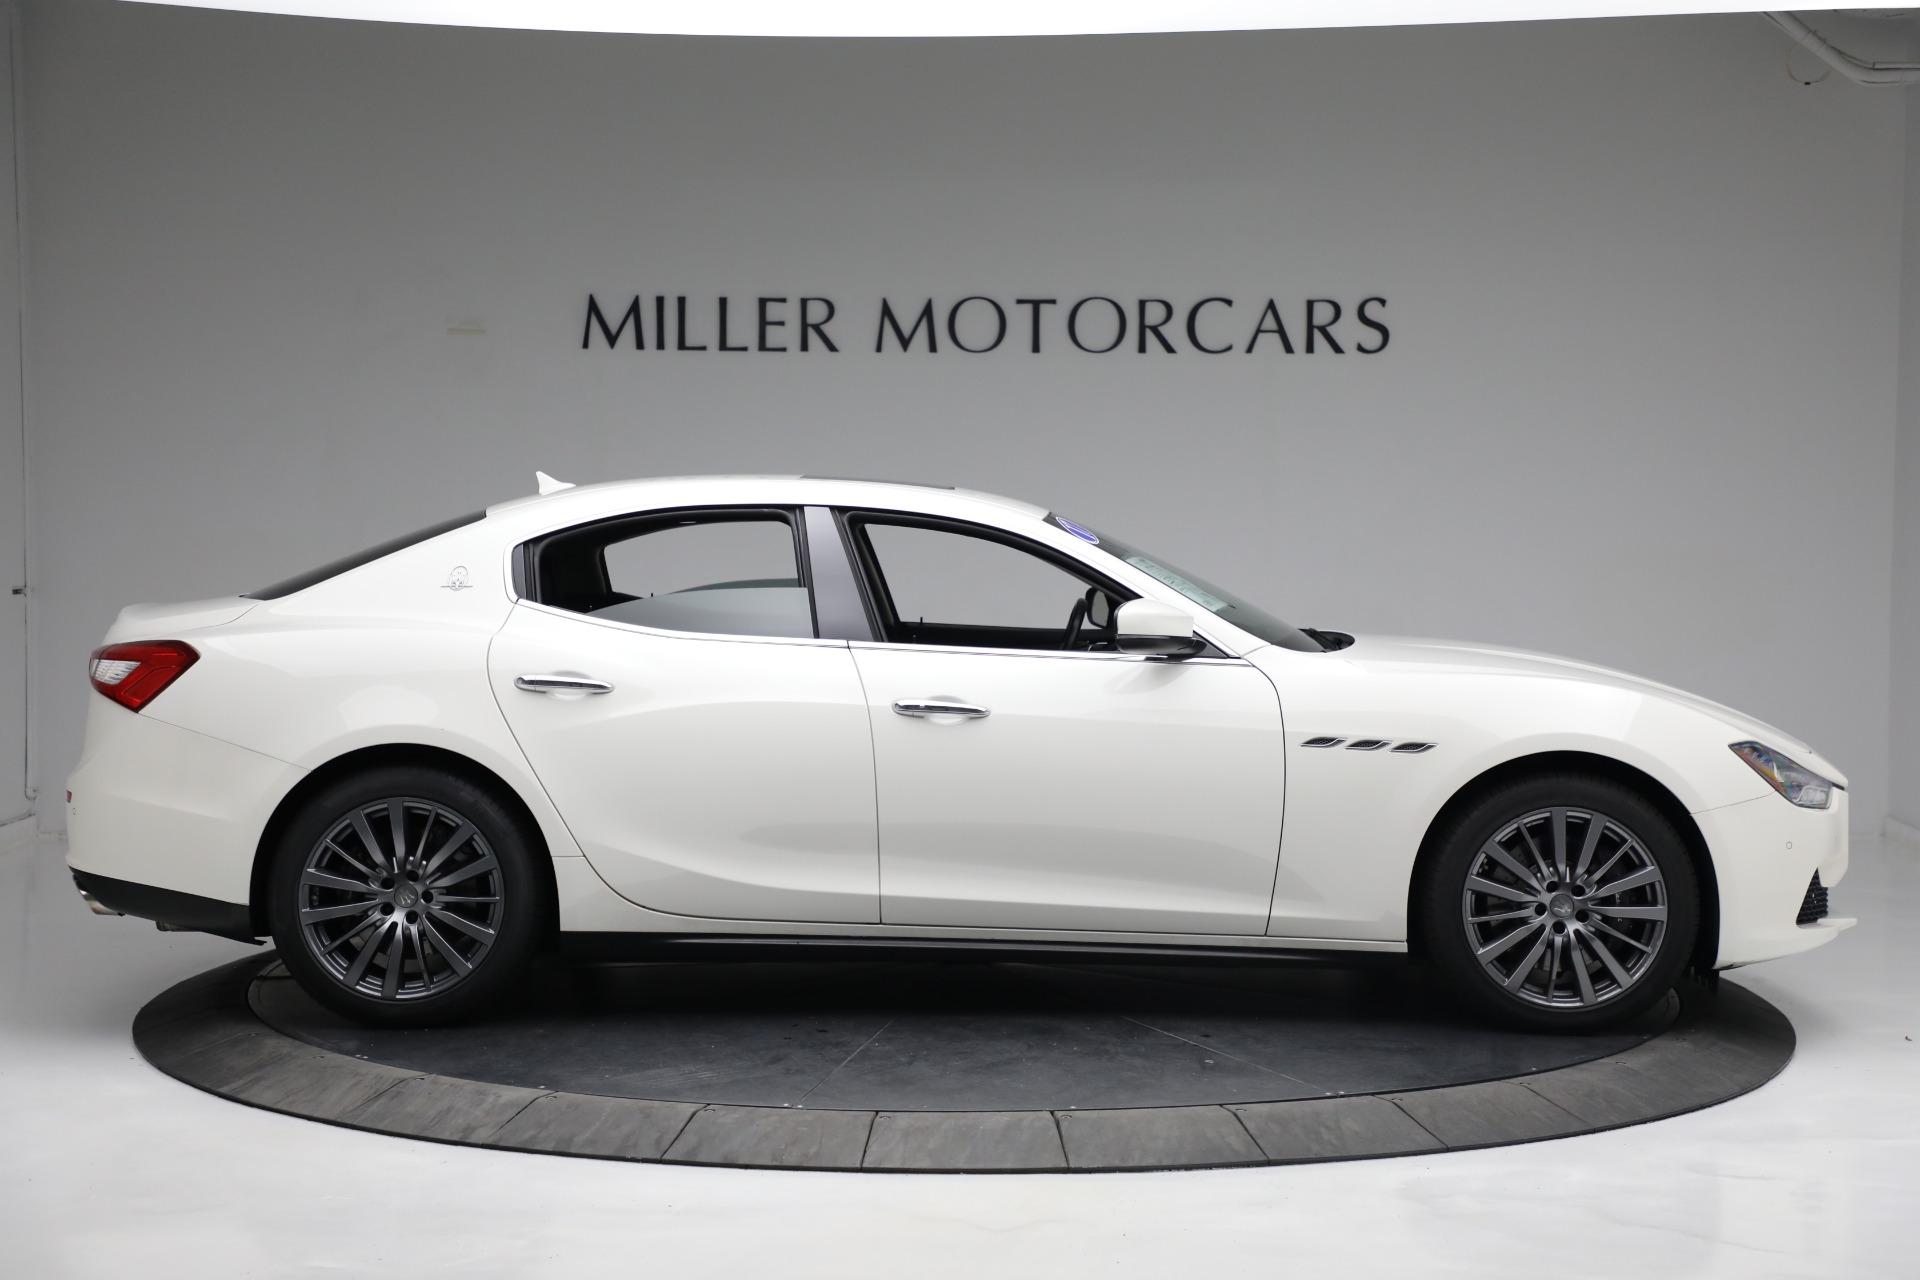 New 2017 Maserati Ghibli S Q4 EX Loaner